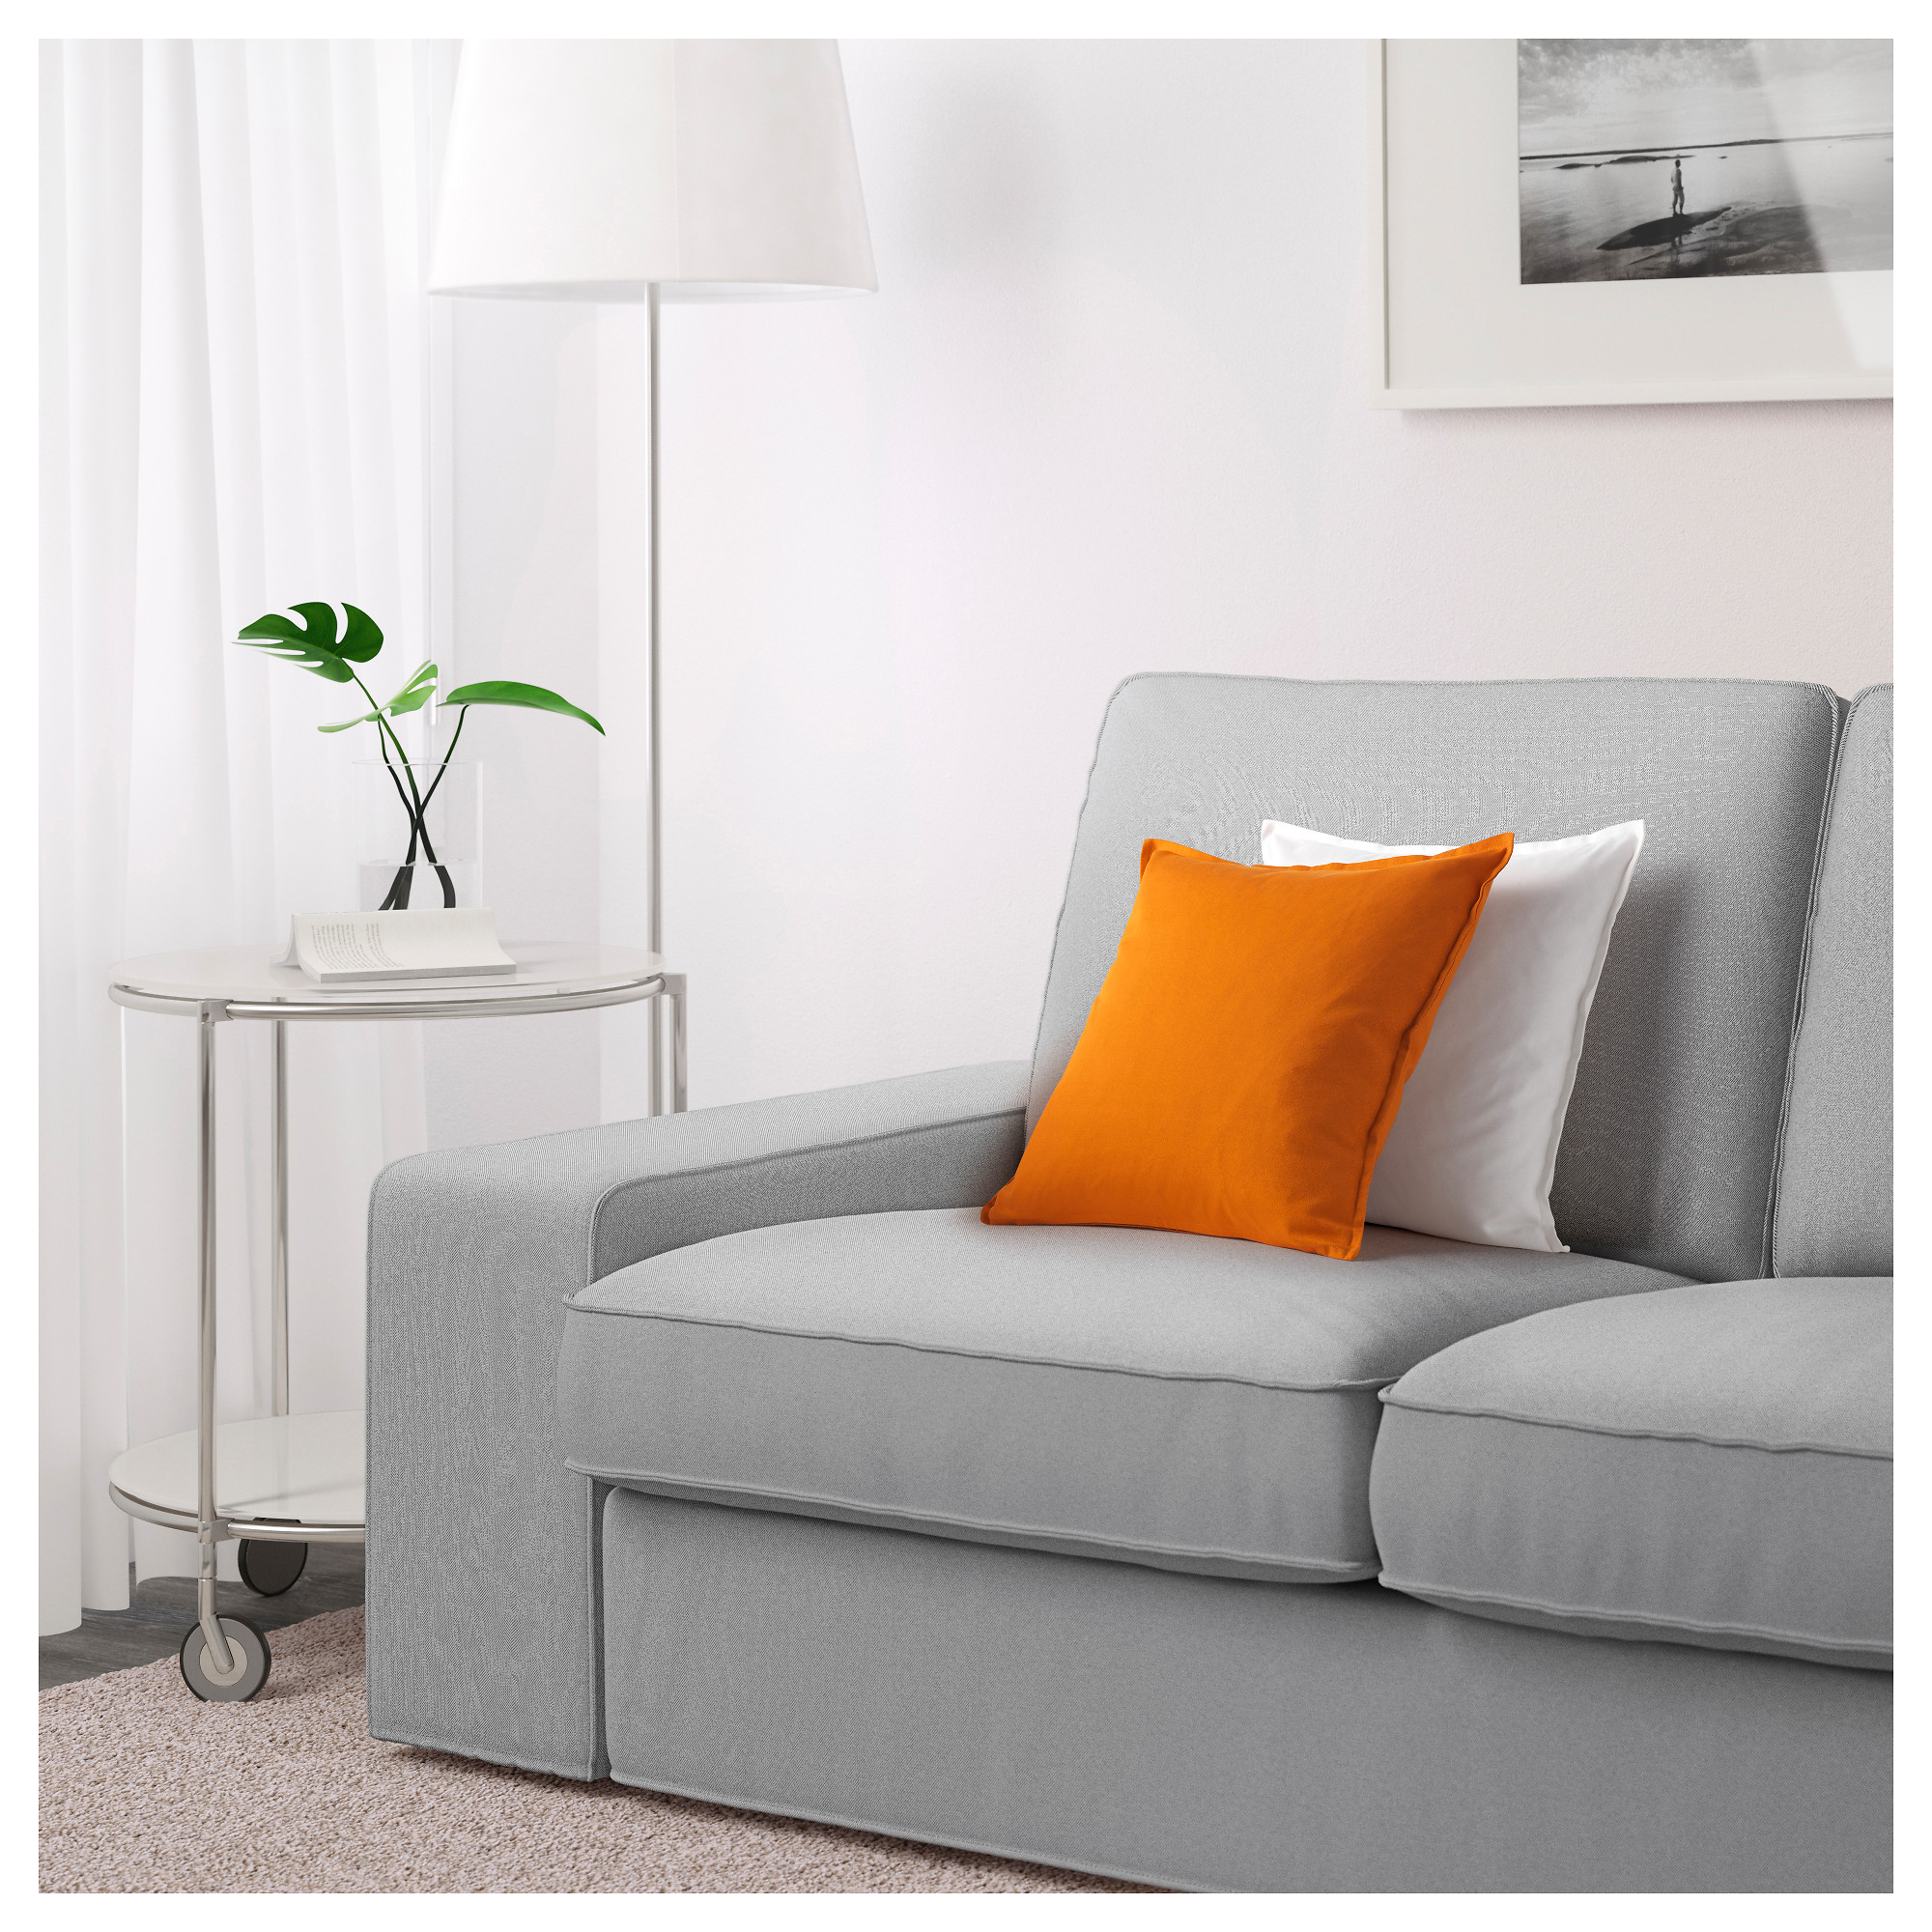 Stupendous Kivik Two Seat Sofa Orrsta Light Grey Ikea Hong Kong Pabps2019 Chair Design Images Pabps2019Com